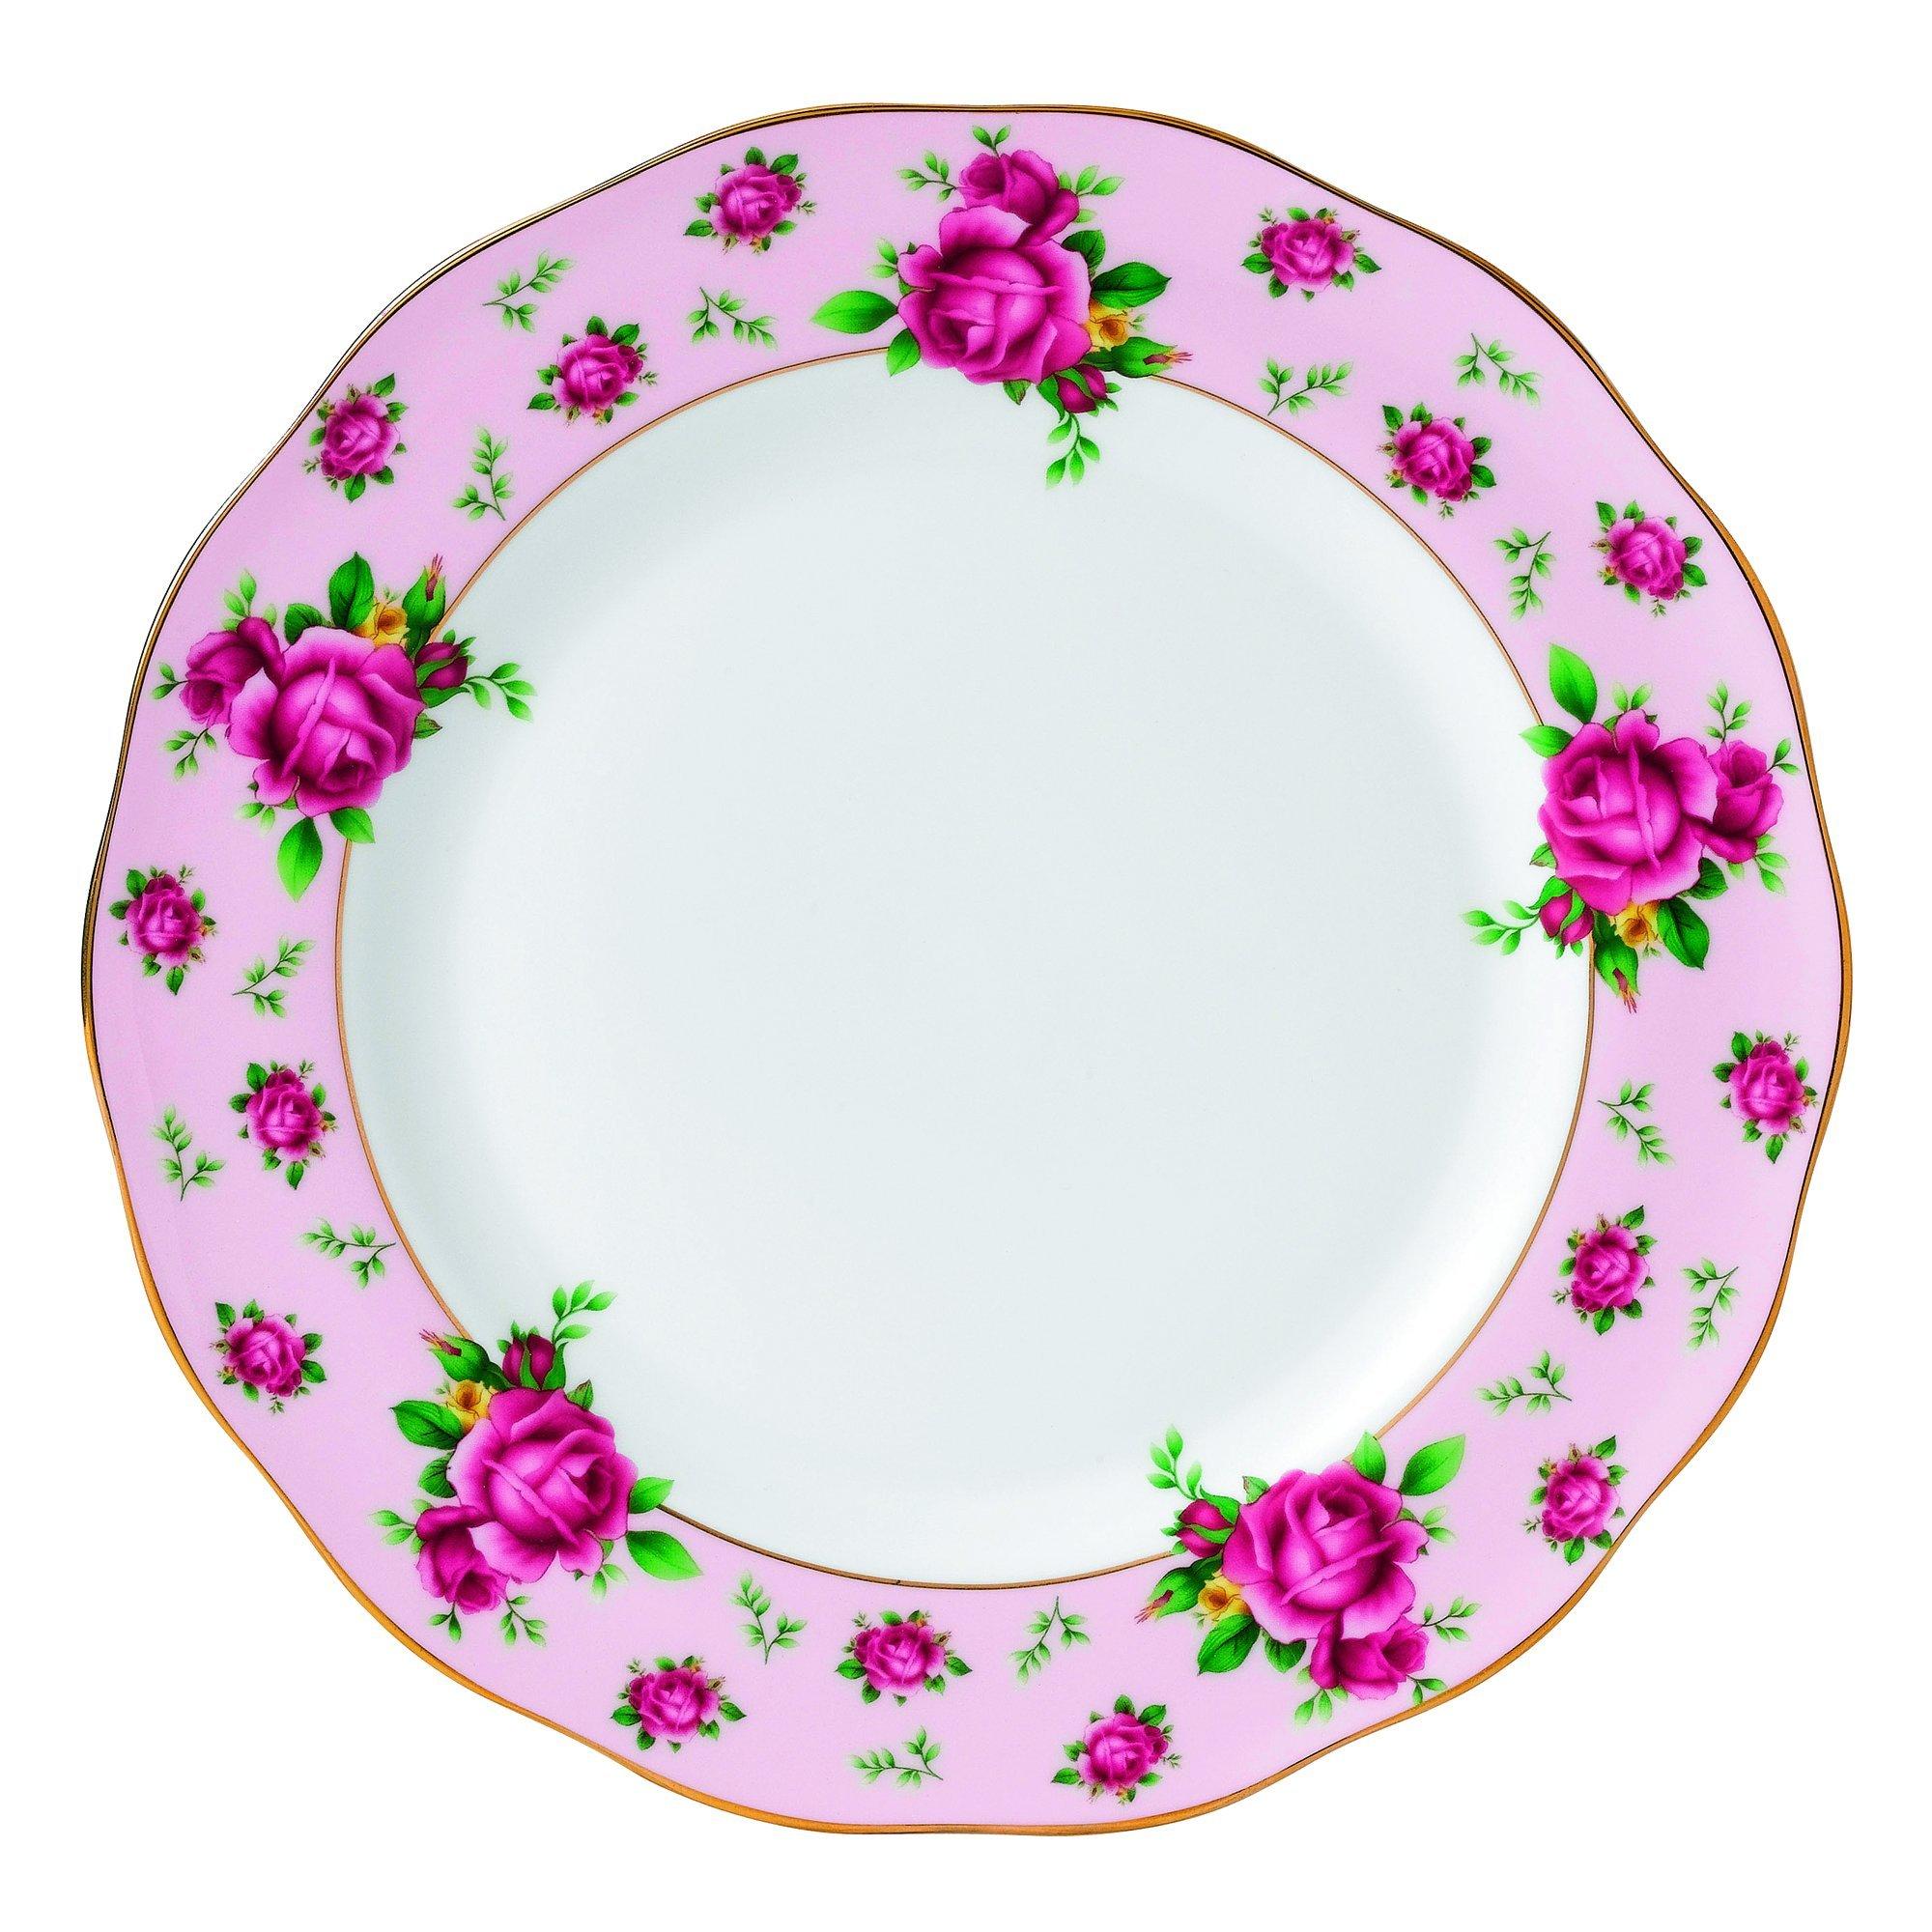 Royal Albert New Country Roses Vintage Formal Dinner Plate, White/Pink